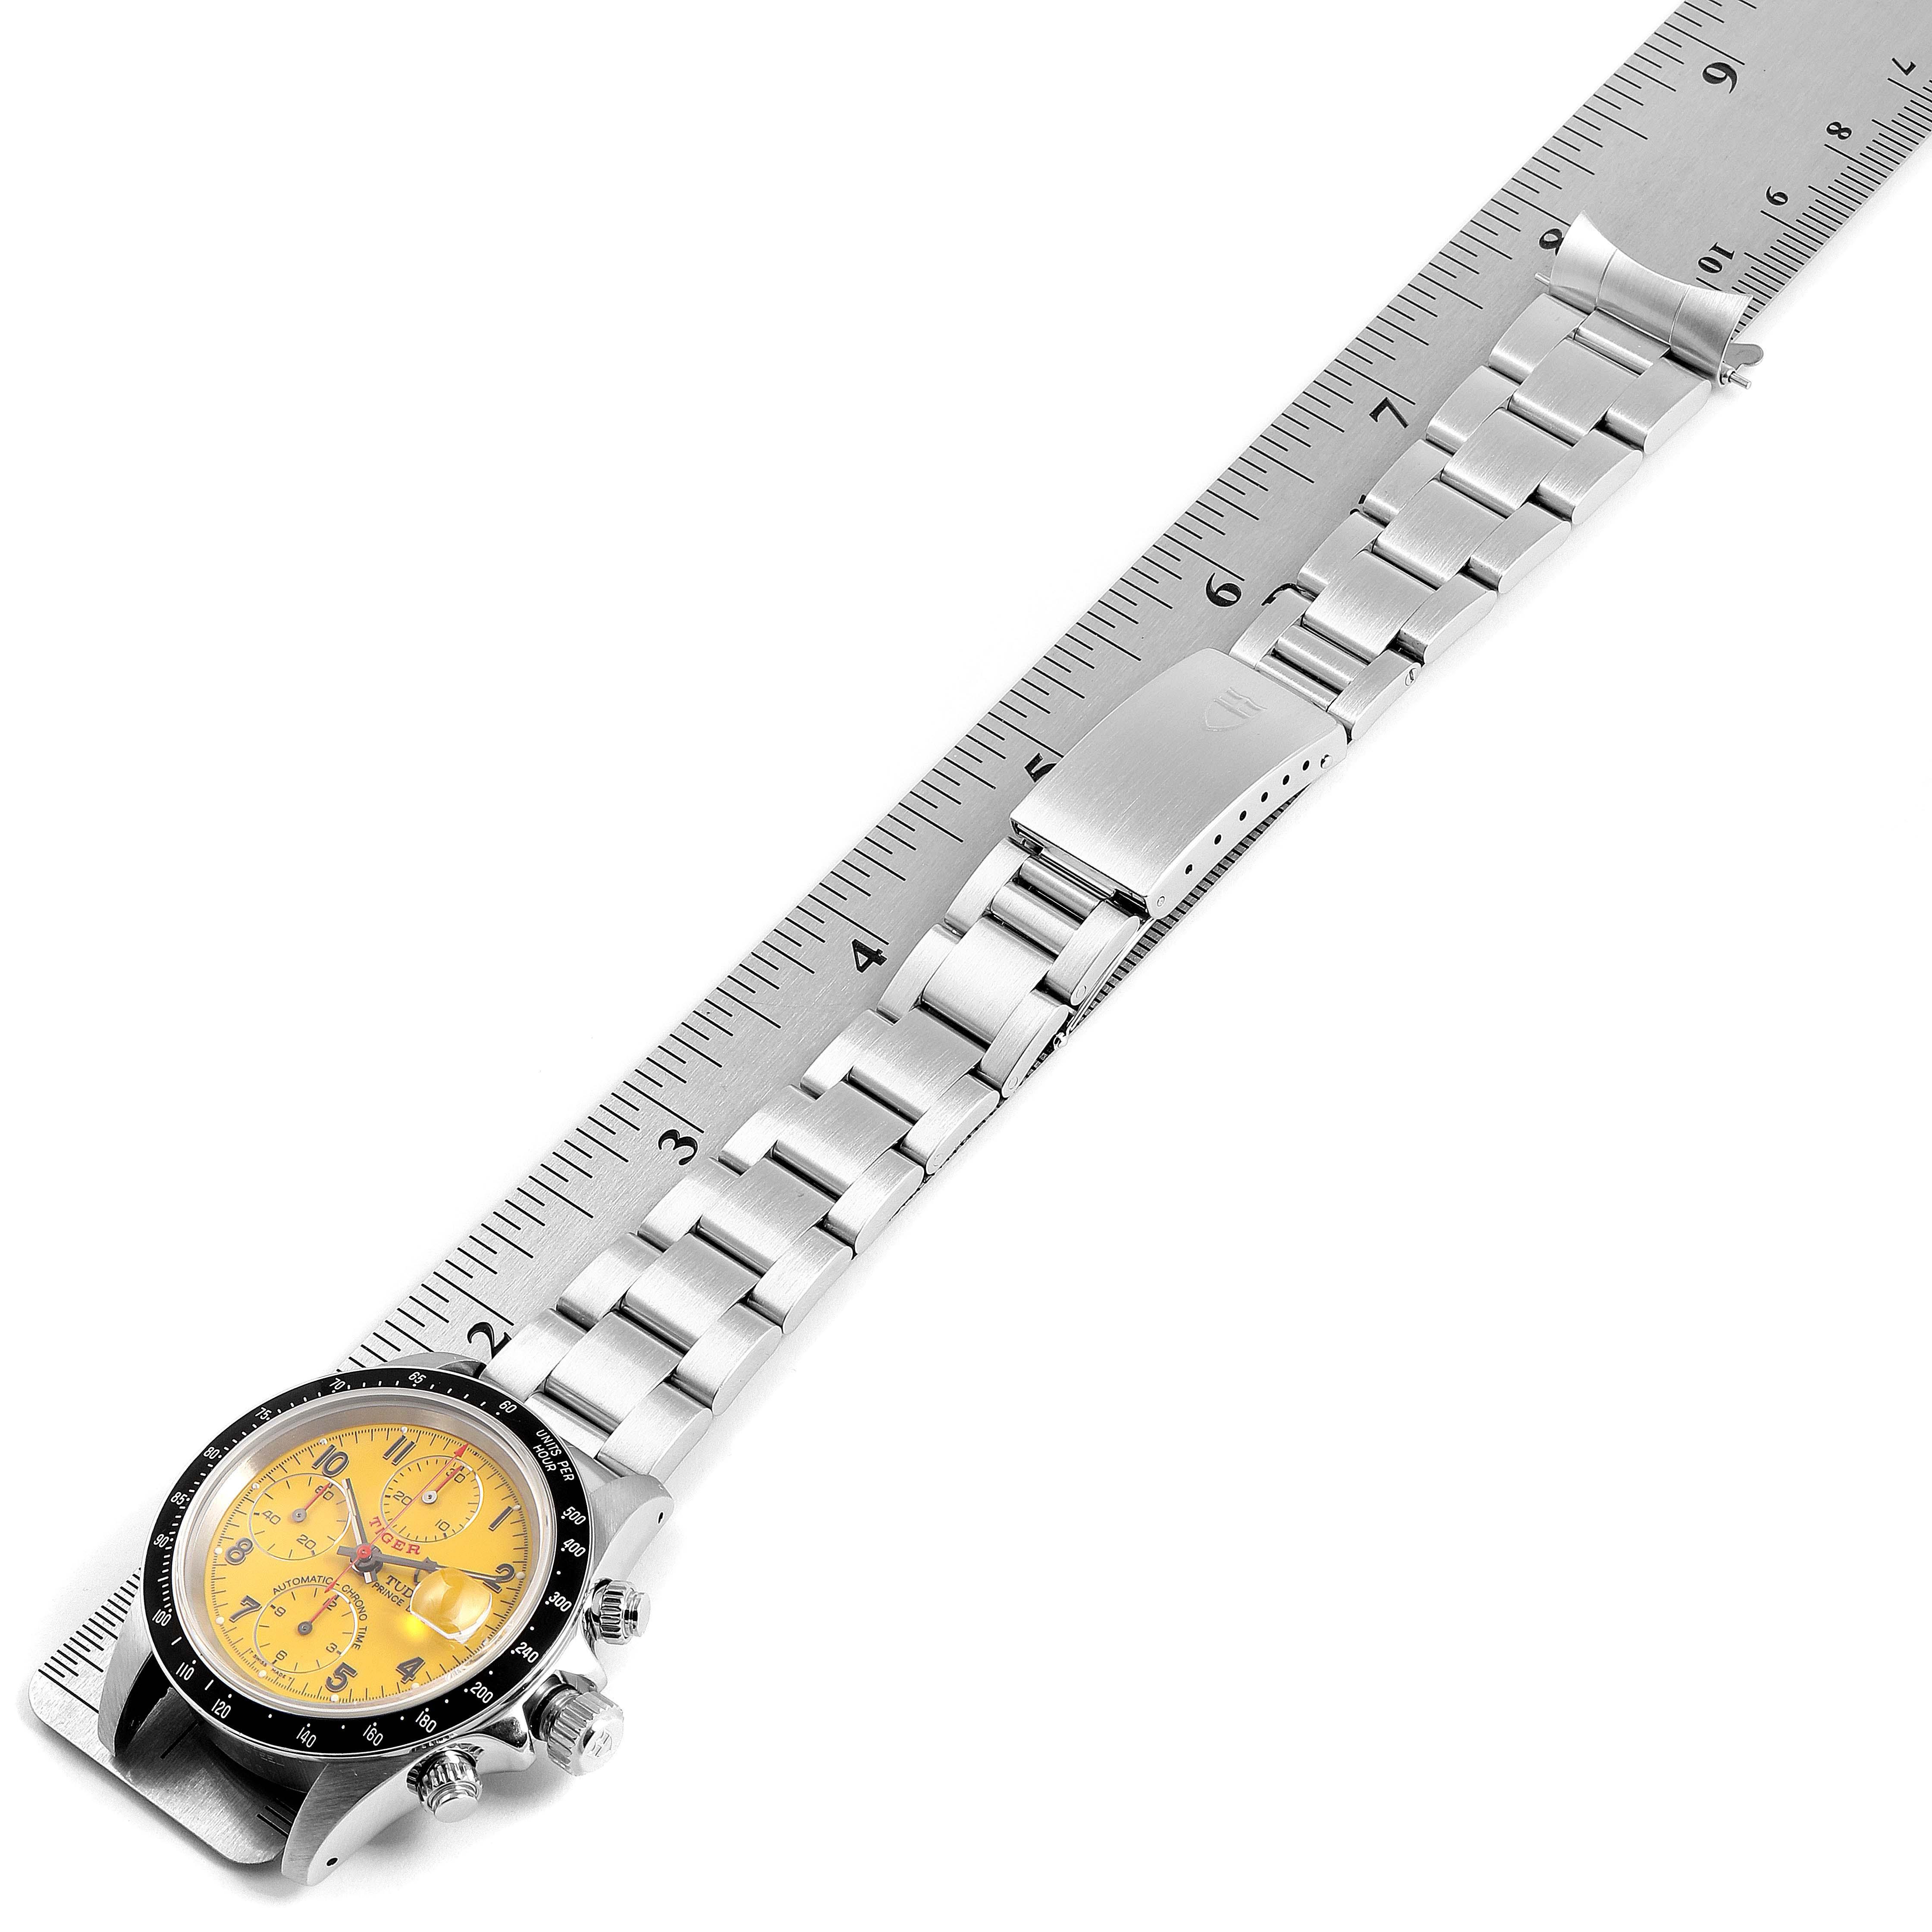 Tudor Tiger Woods Prince Chronograph Yellow Dial Mens Watch 79260 SwissWatchExpo